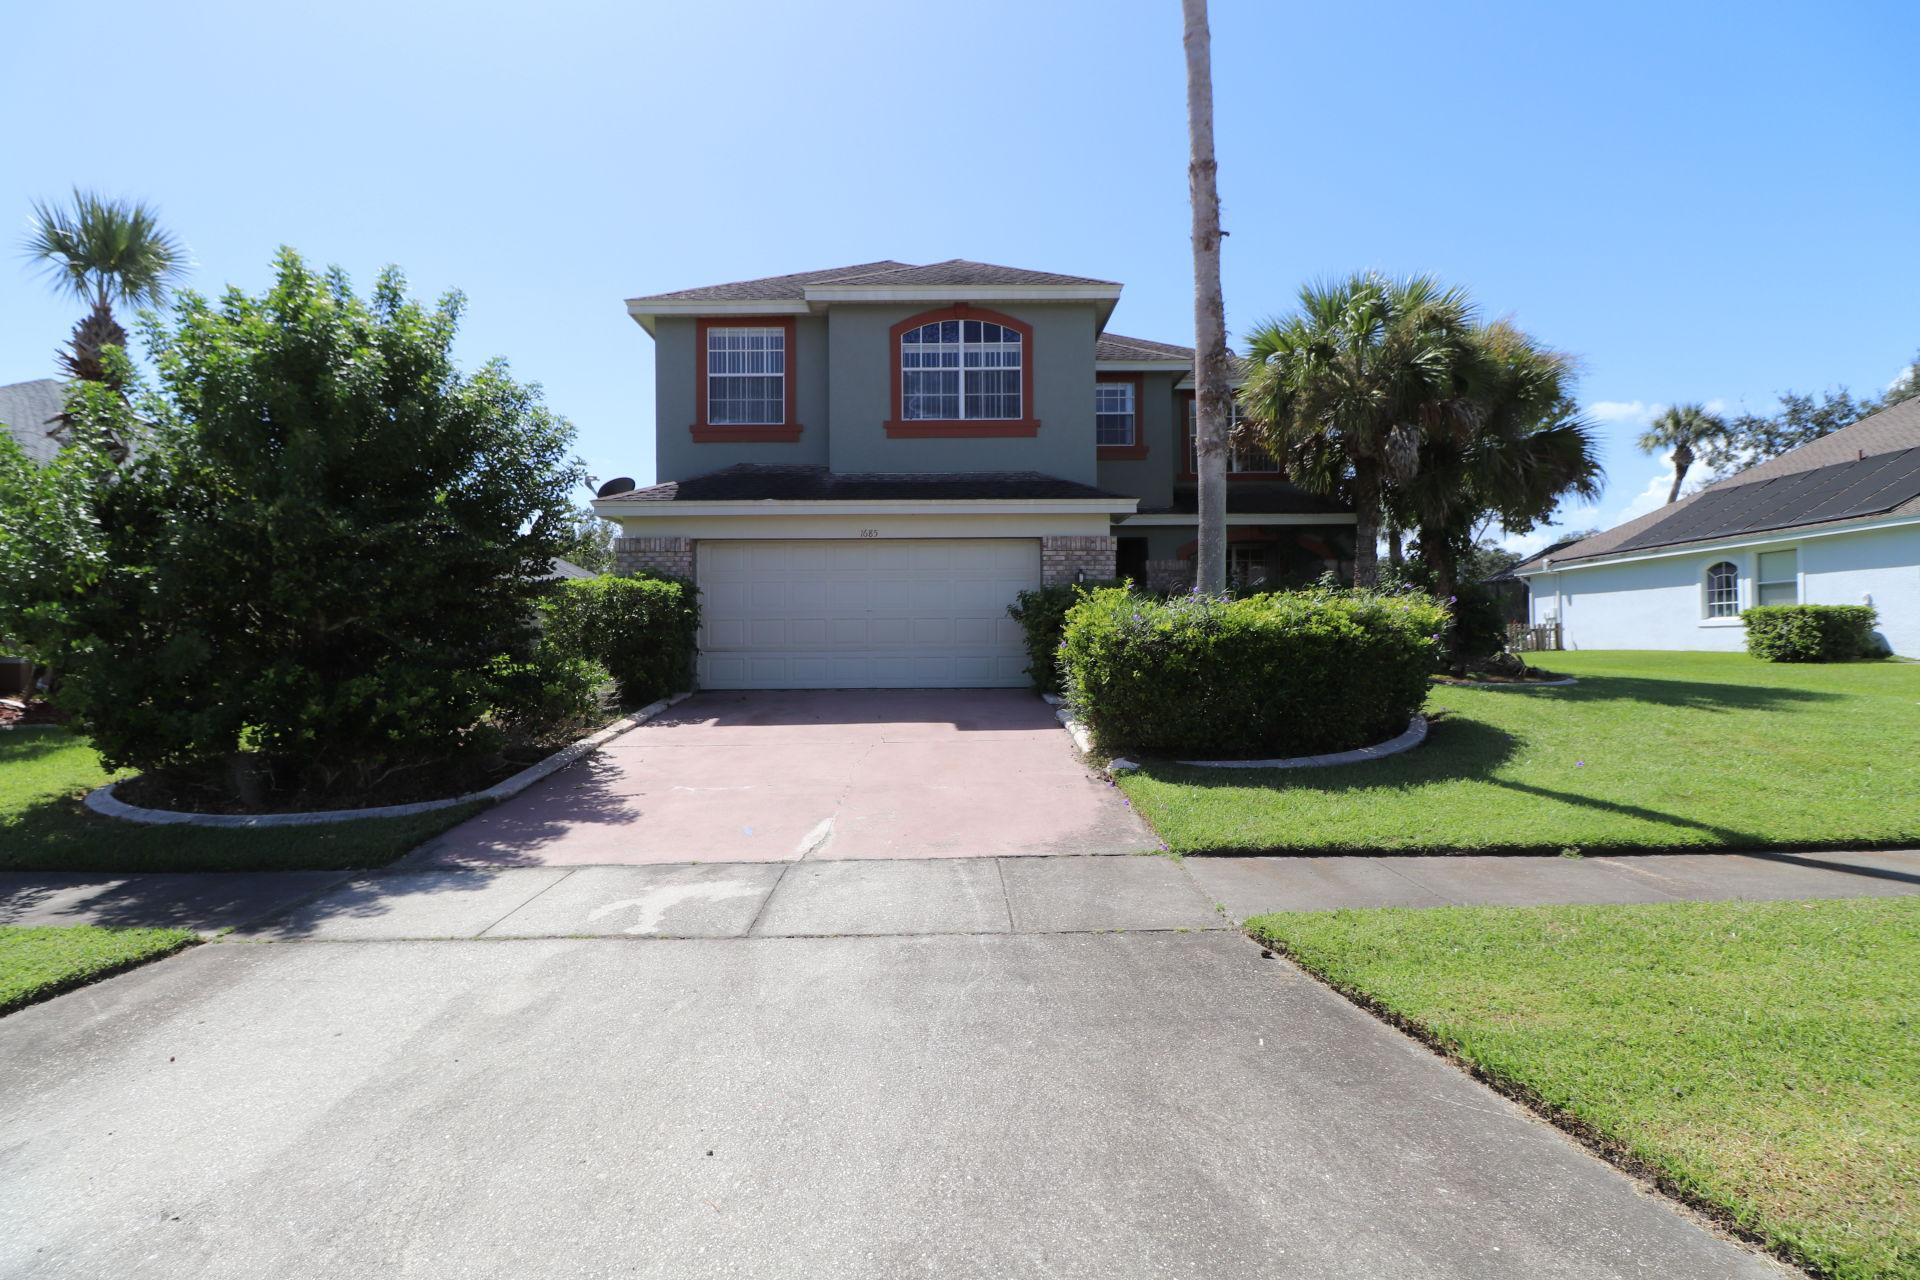 1685 THE OAKS BLVD, KISSIMMEE, FL 34746